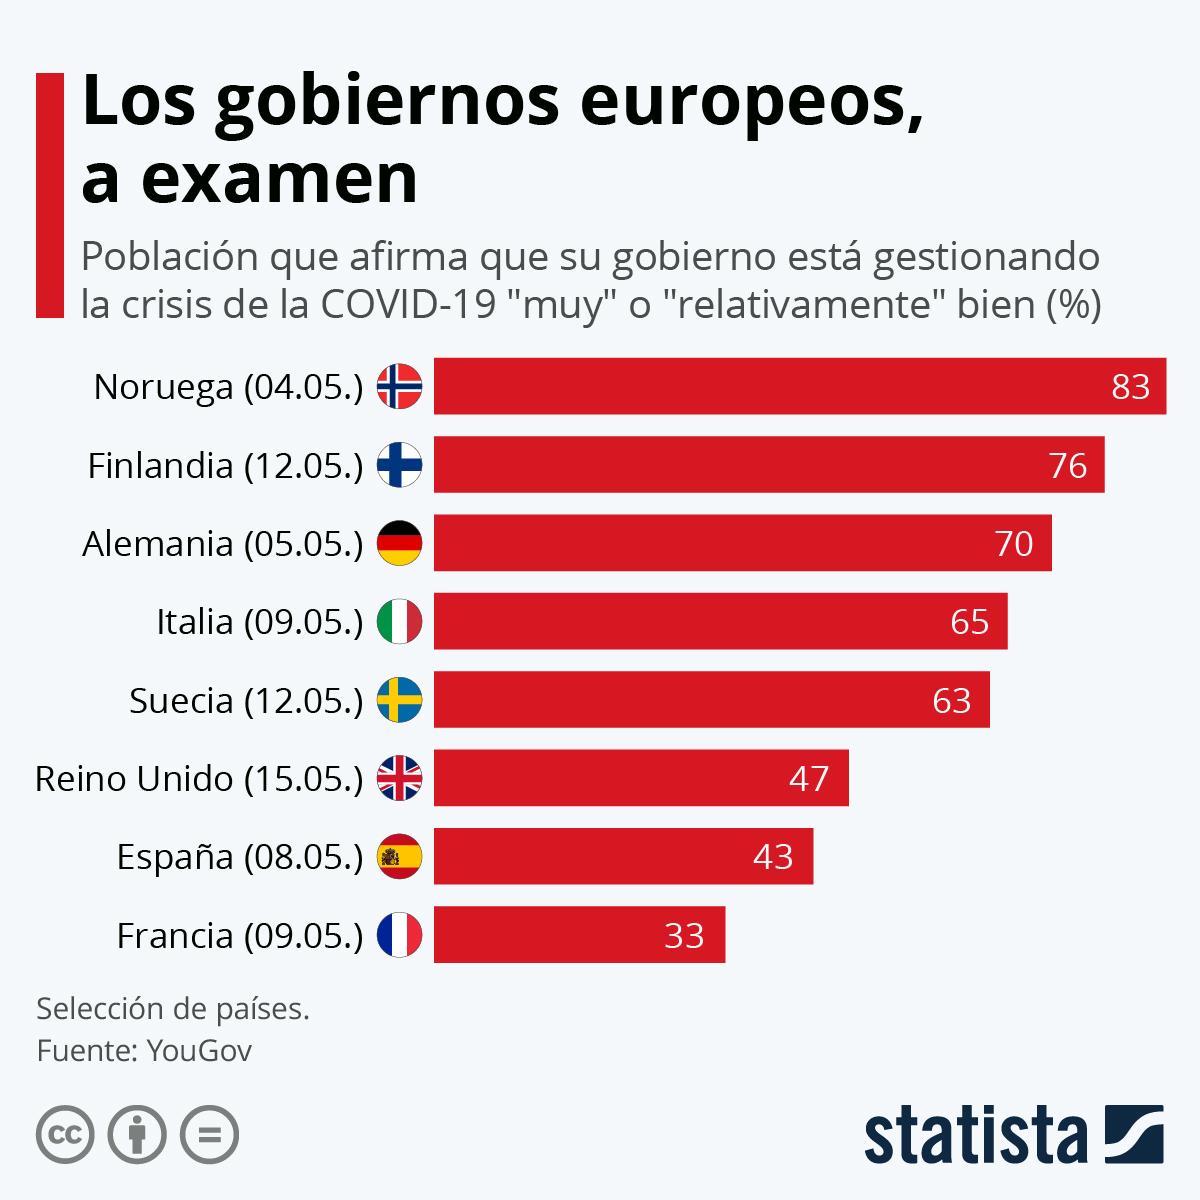 Infografía: Los gobiernos europeos, a examen | Statista